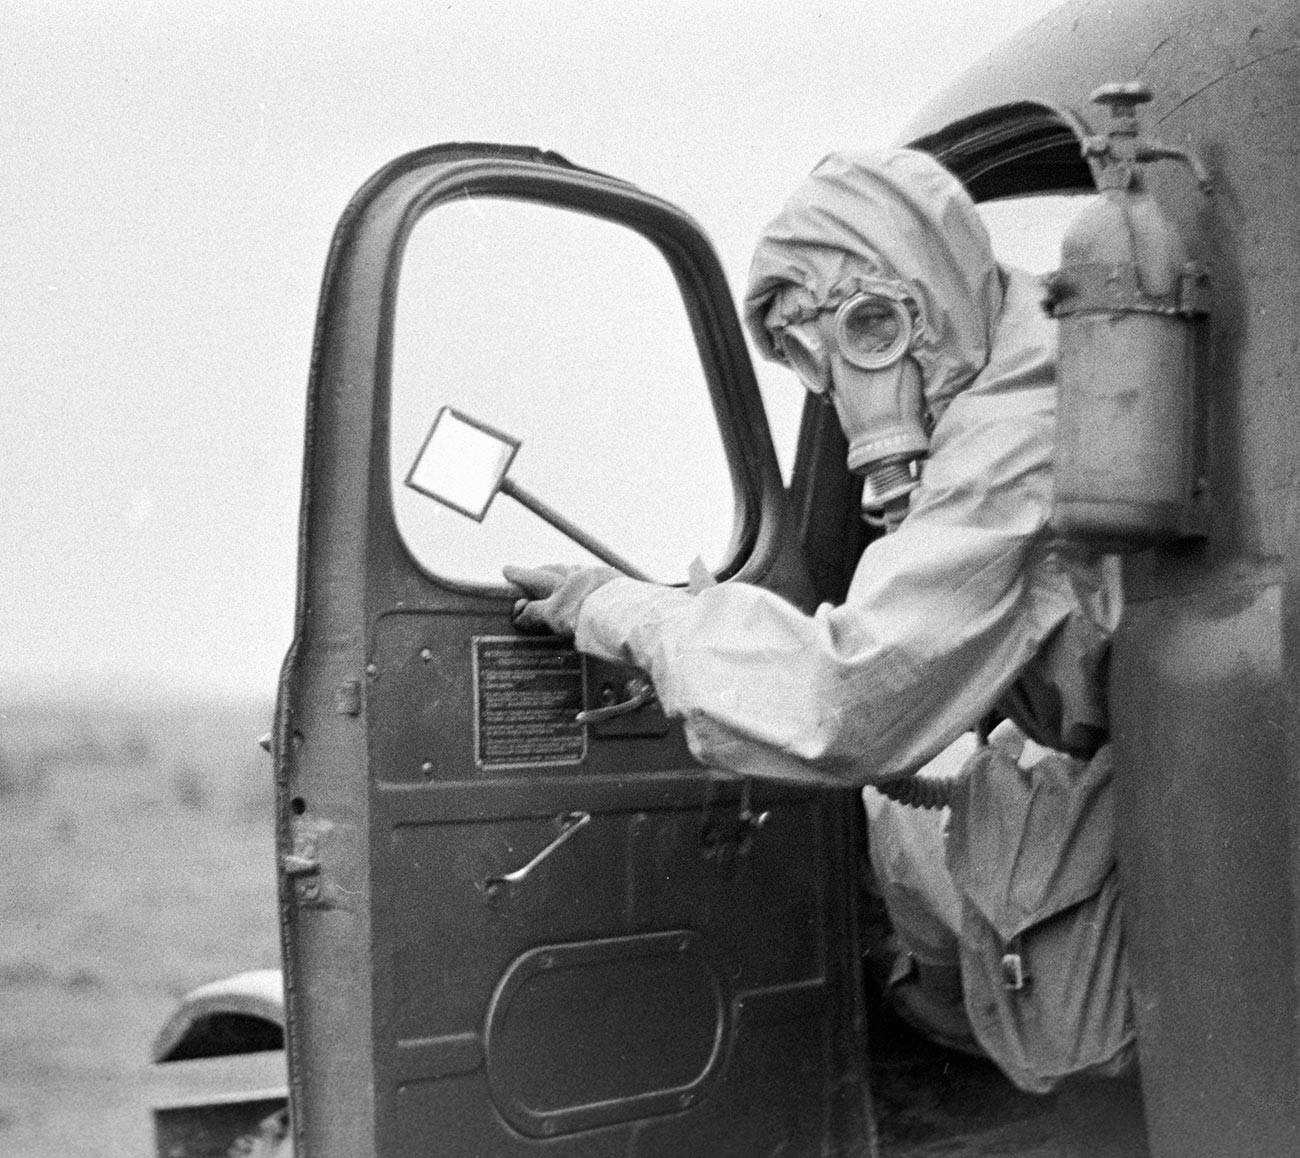 Esercitazioni delle truppe sovietiche di difesa radiologica, chimica e biologica